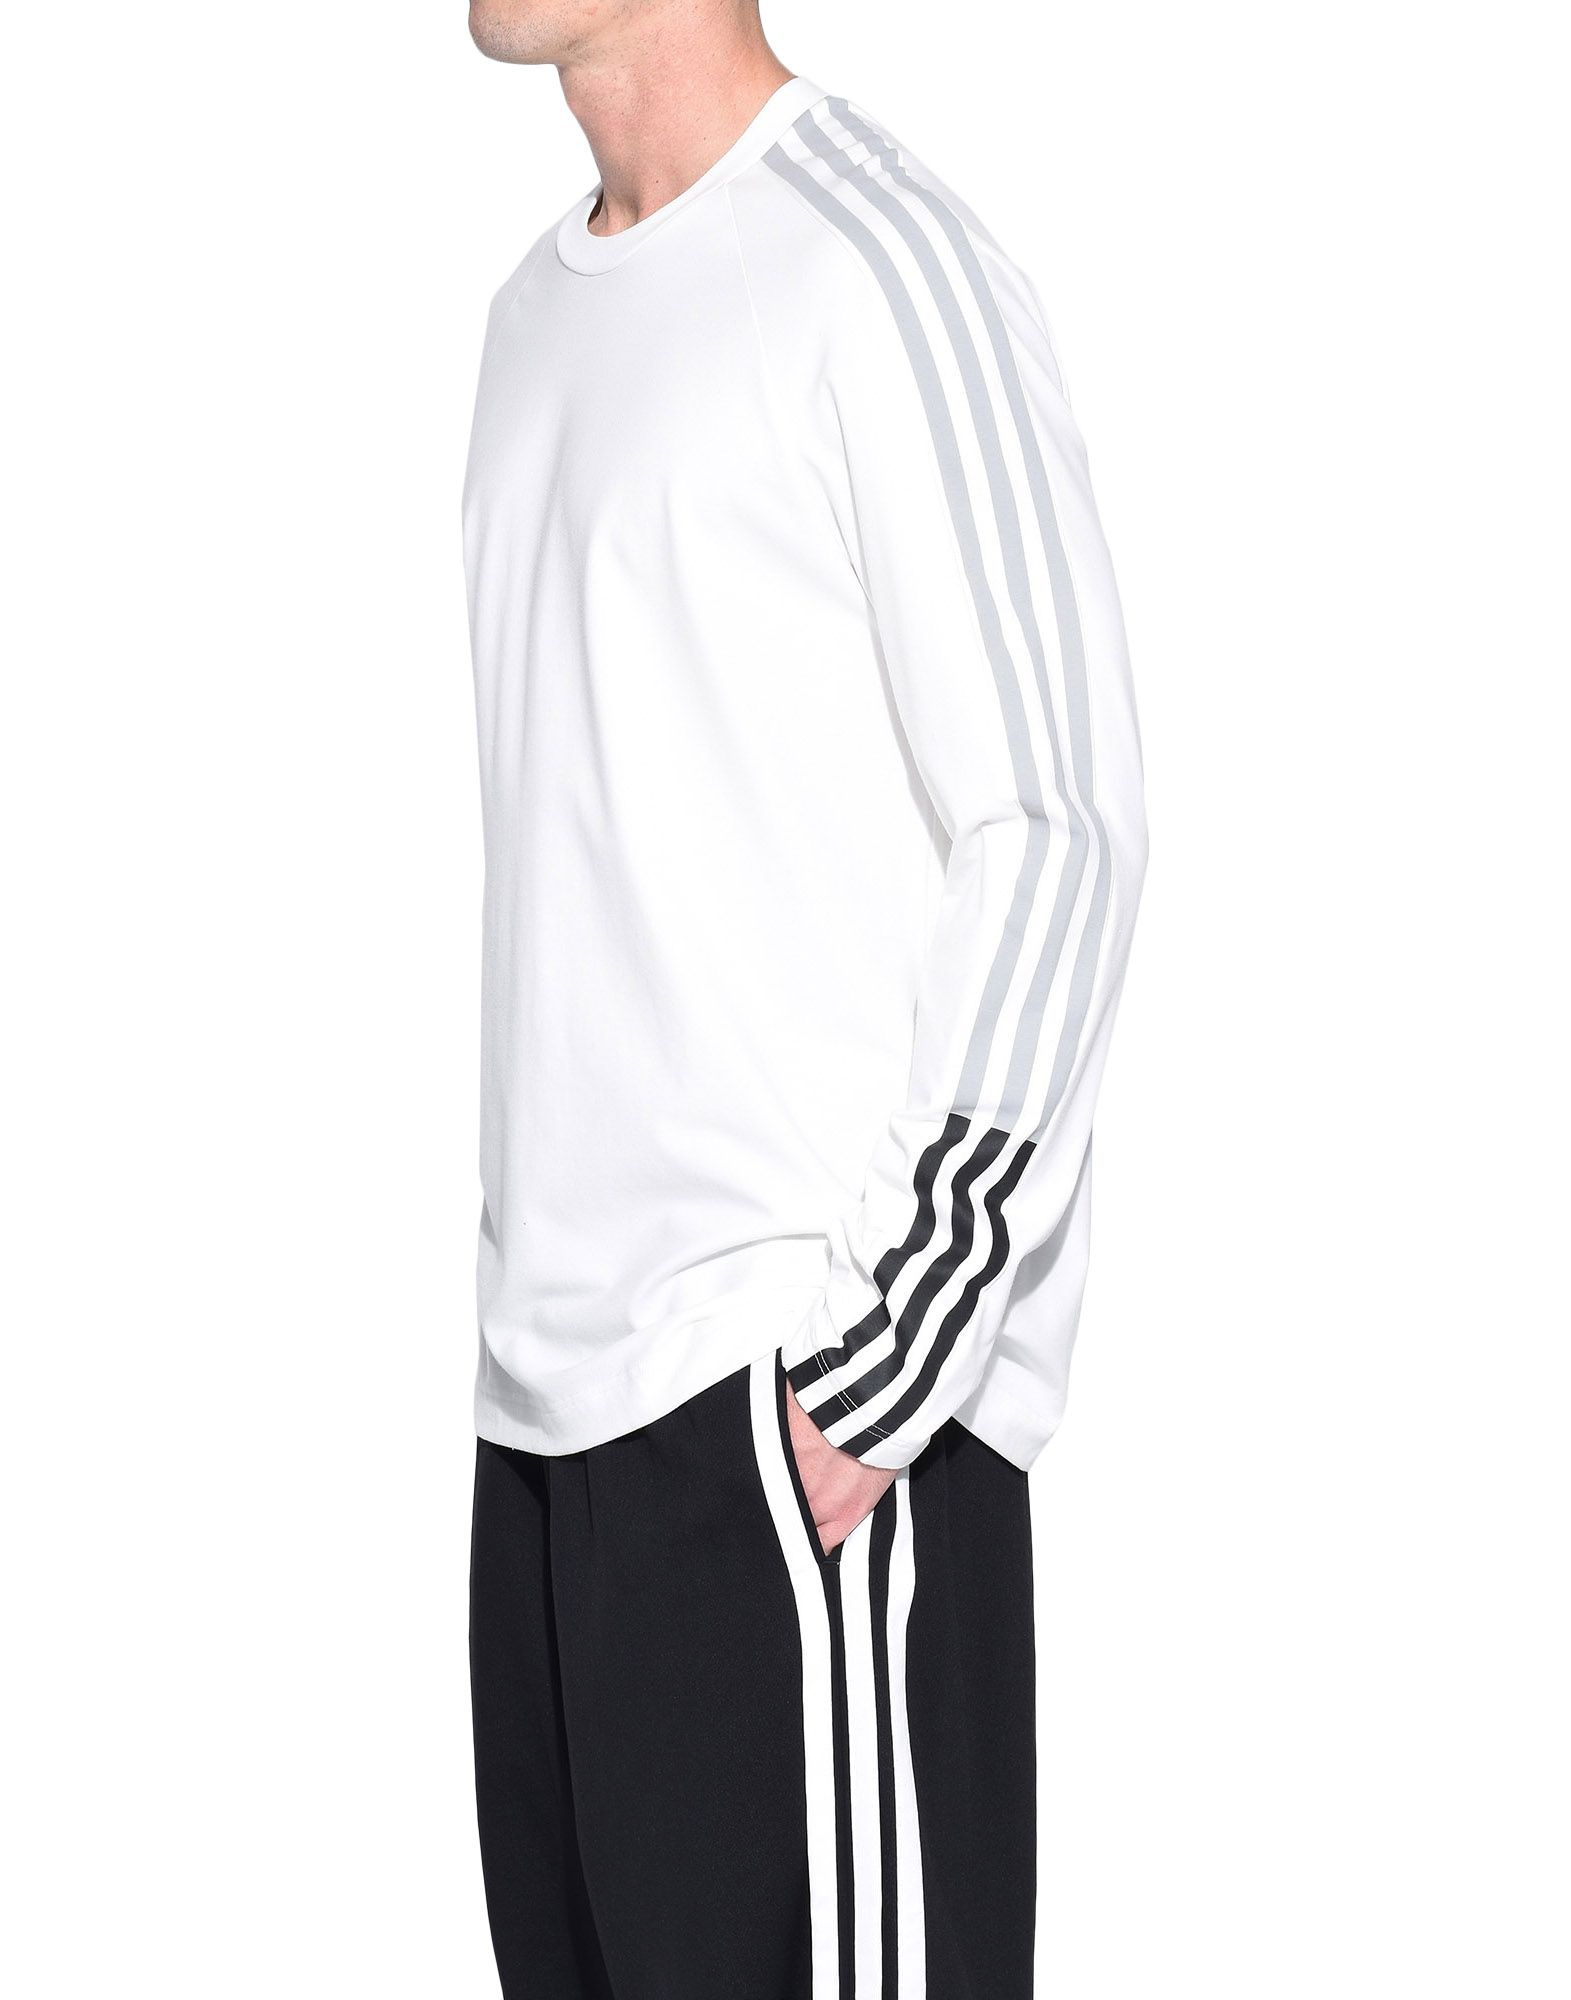 Y-3 Y-3 3-Stripes Tee Long sleeve t-shirt Man e